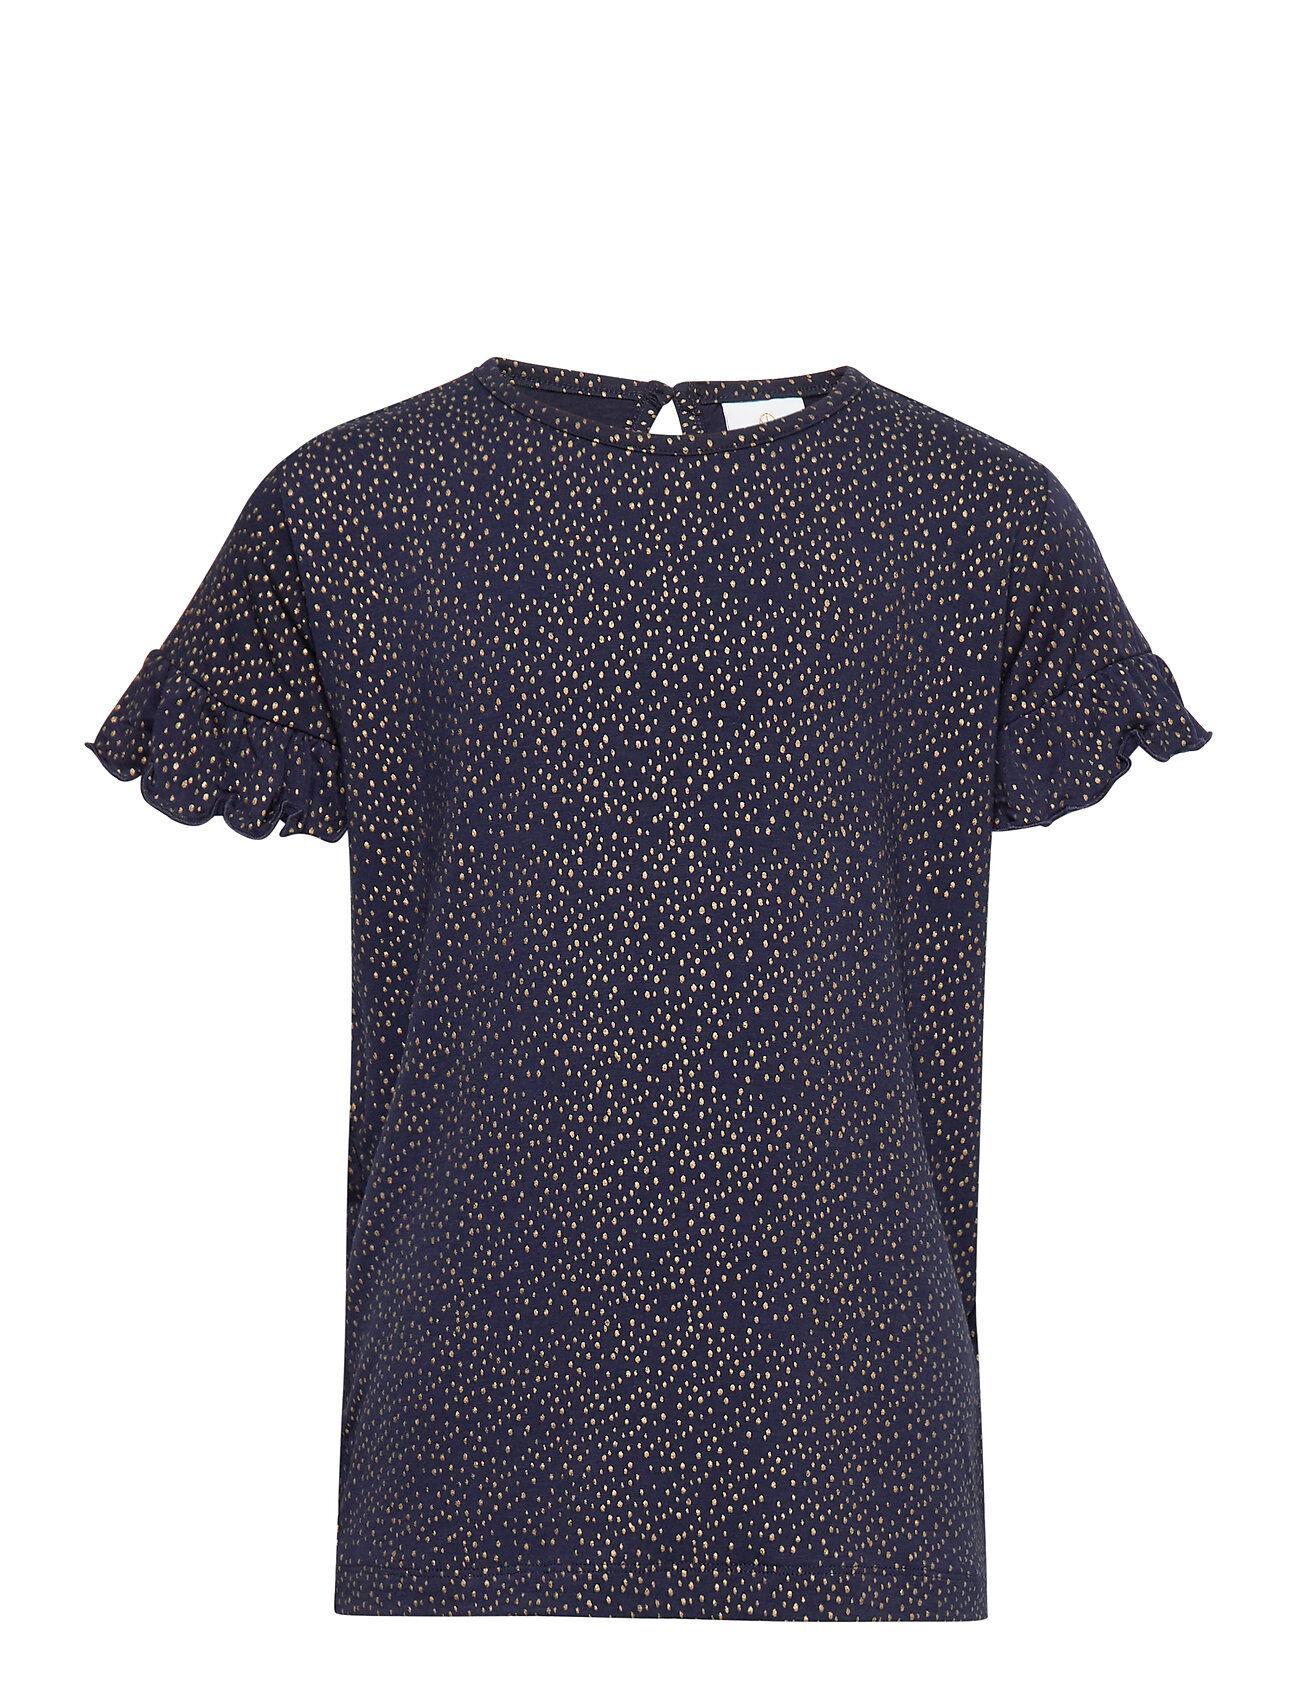 The New Olvia S_s Tee T-shirts Short-sleeved Sininen